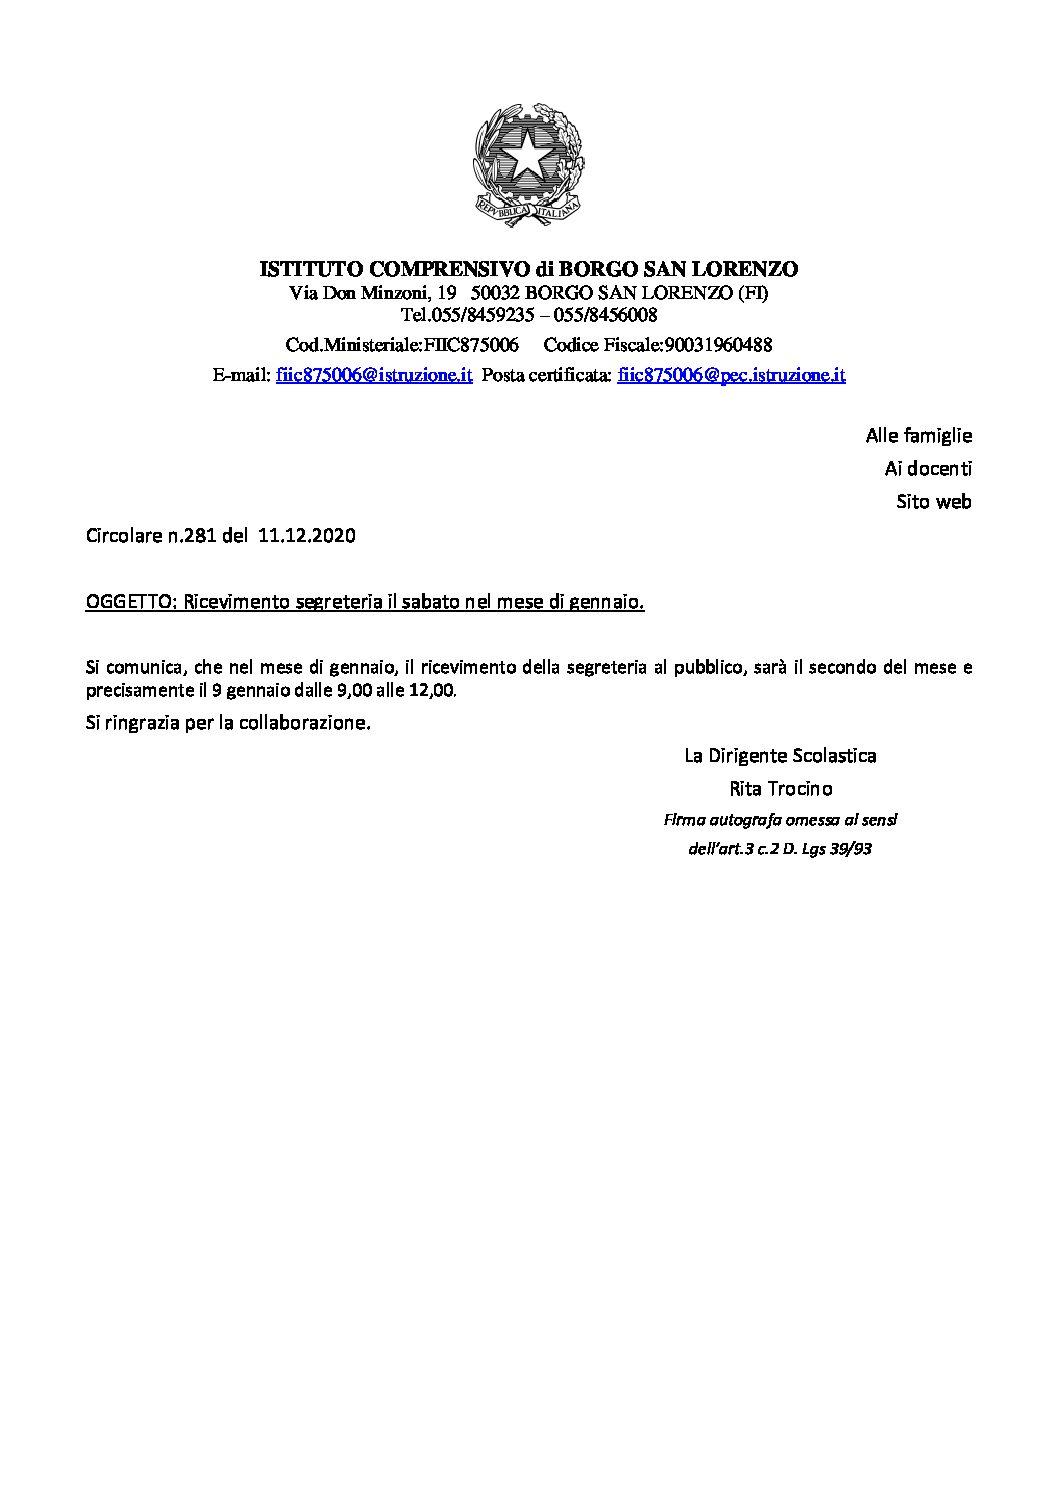 RICEVIMENTO SEGRETERIA SABATO 9/01/20